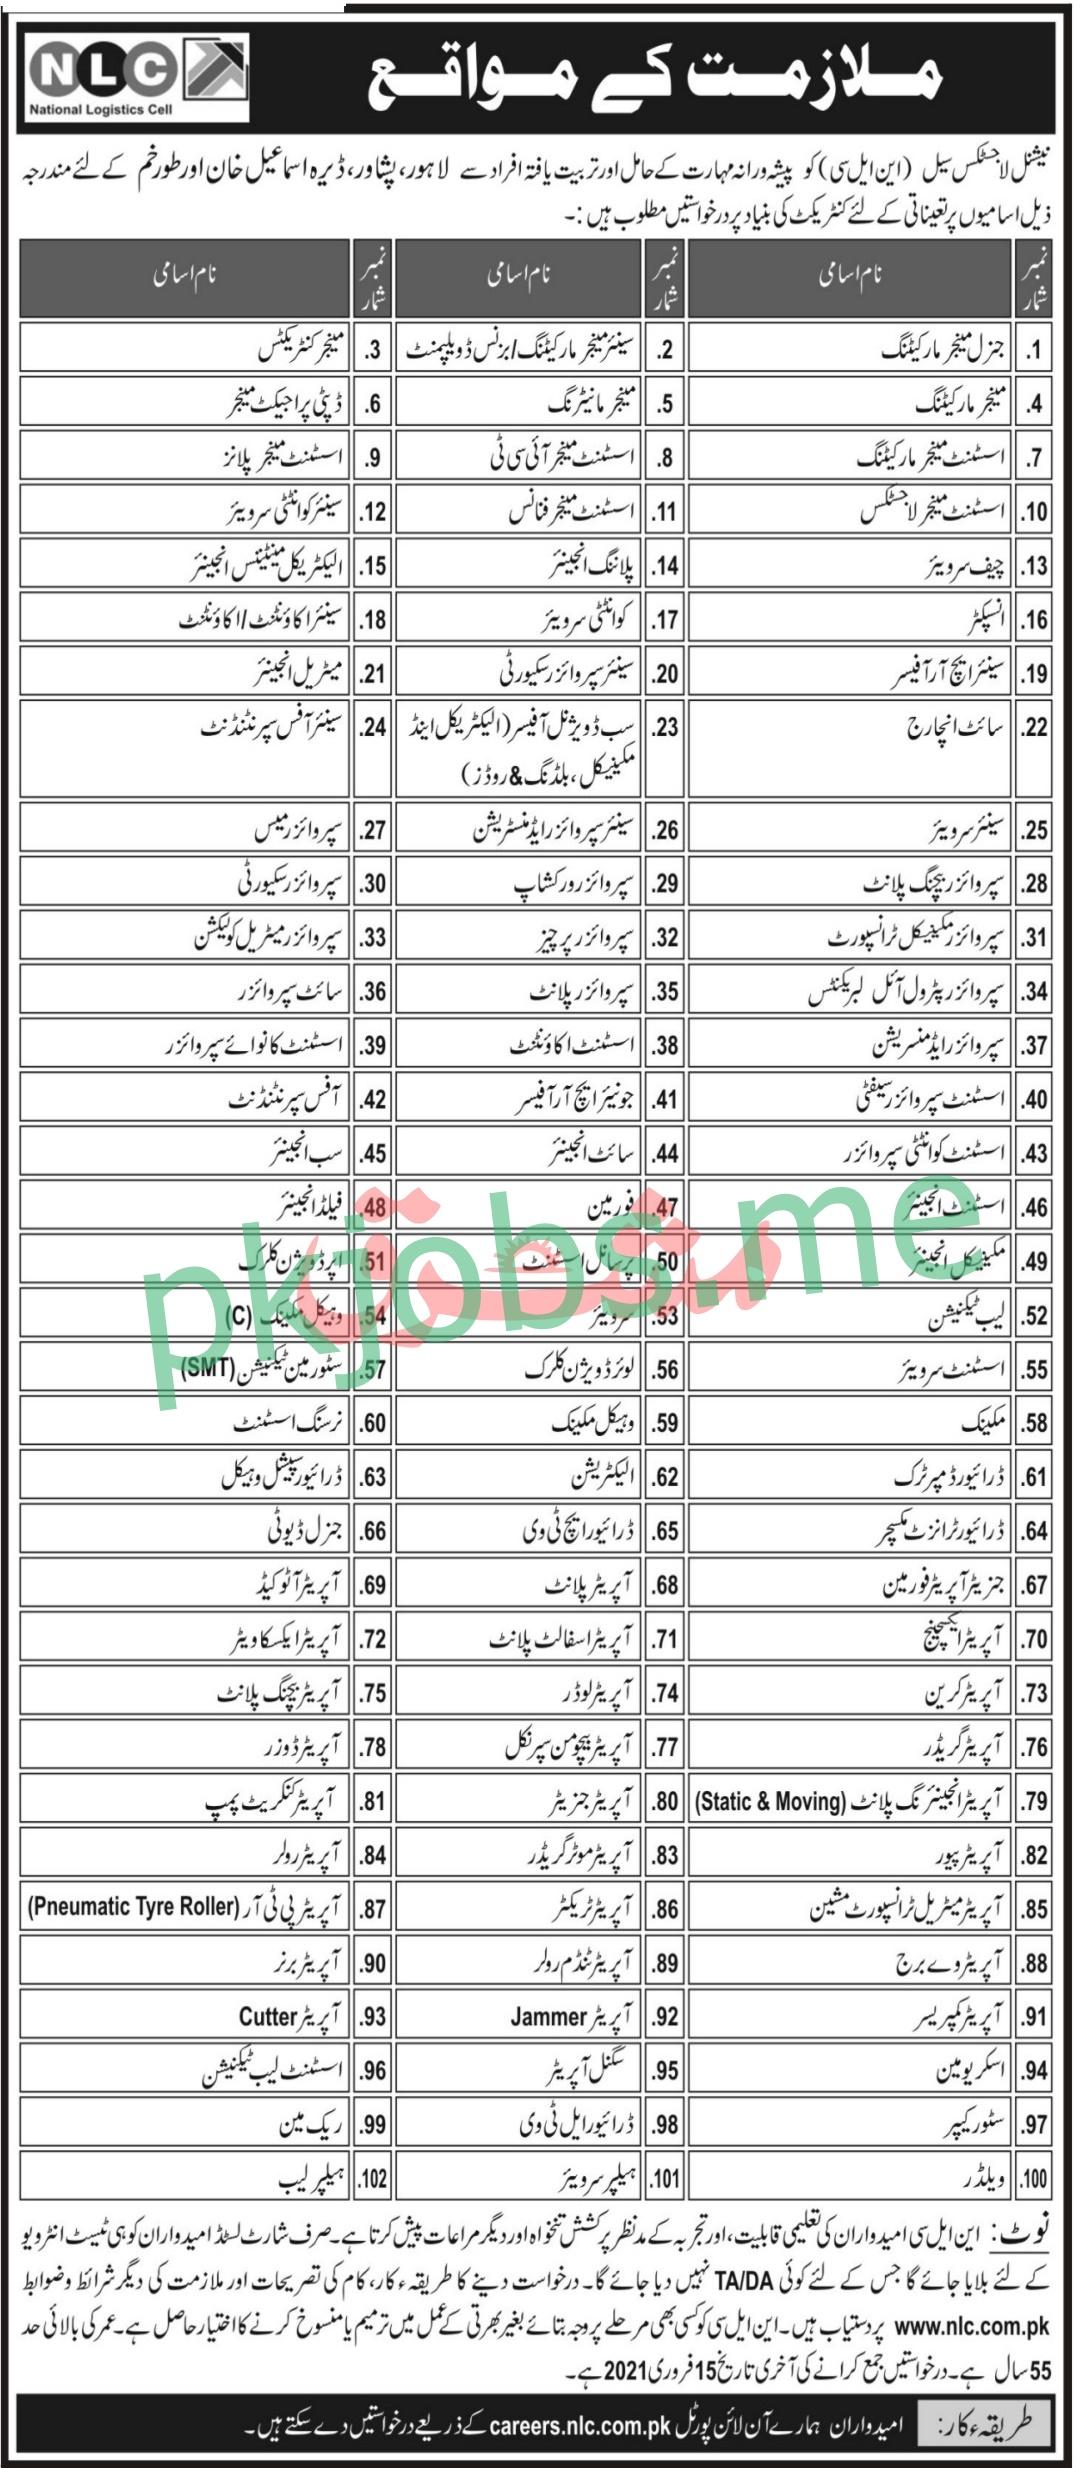 Latest NLC Jobs in Pakistan 2021